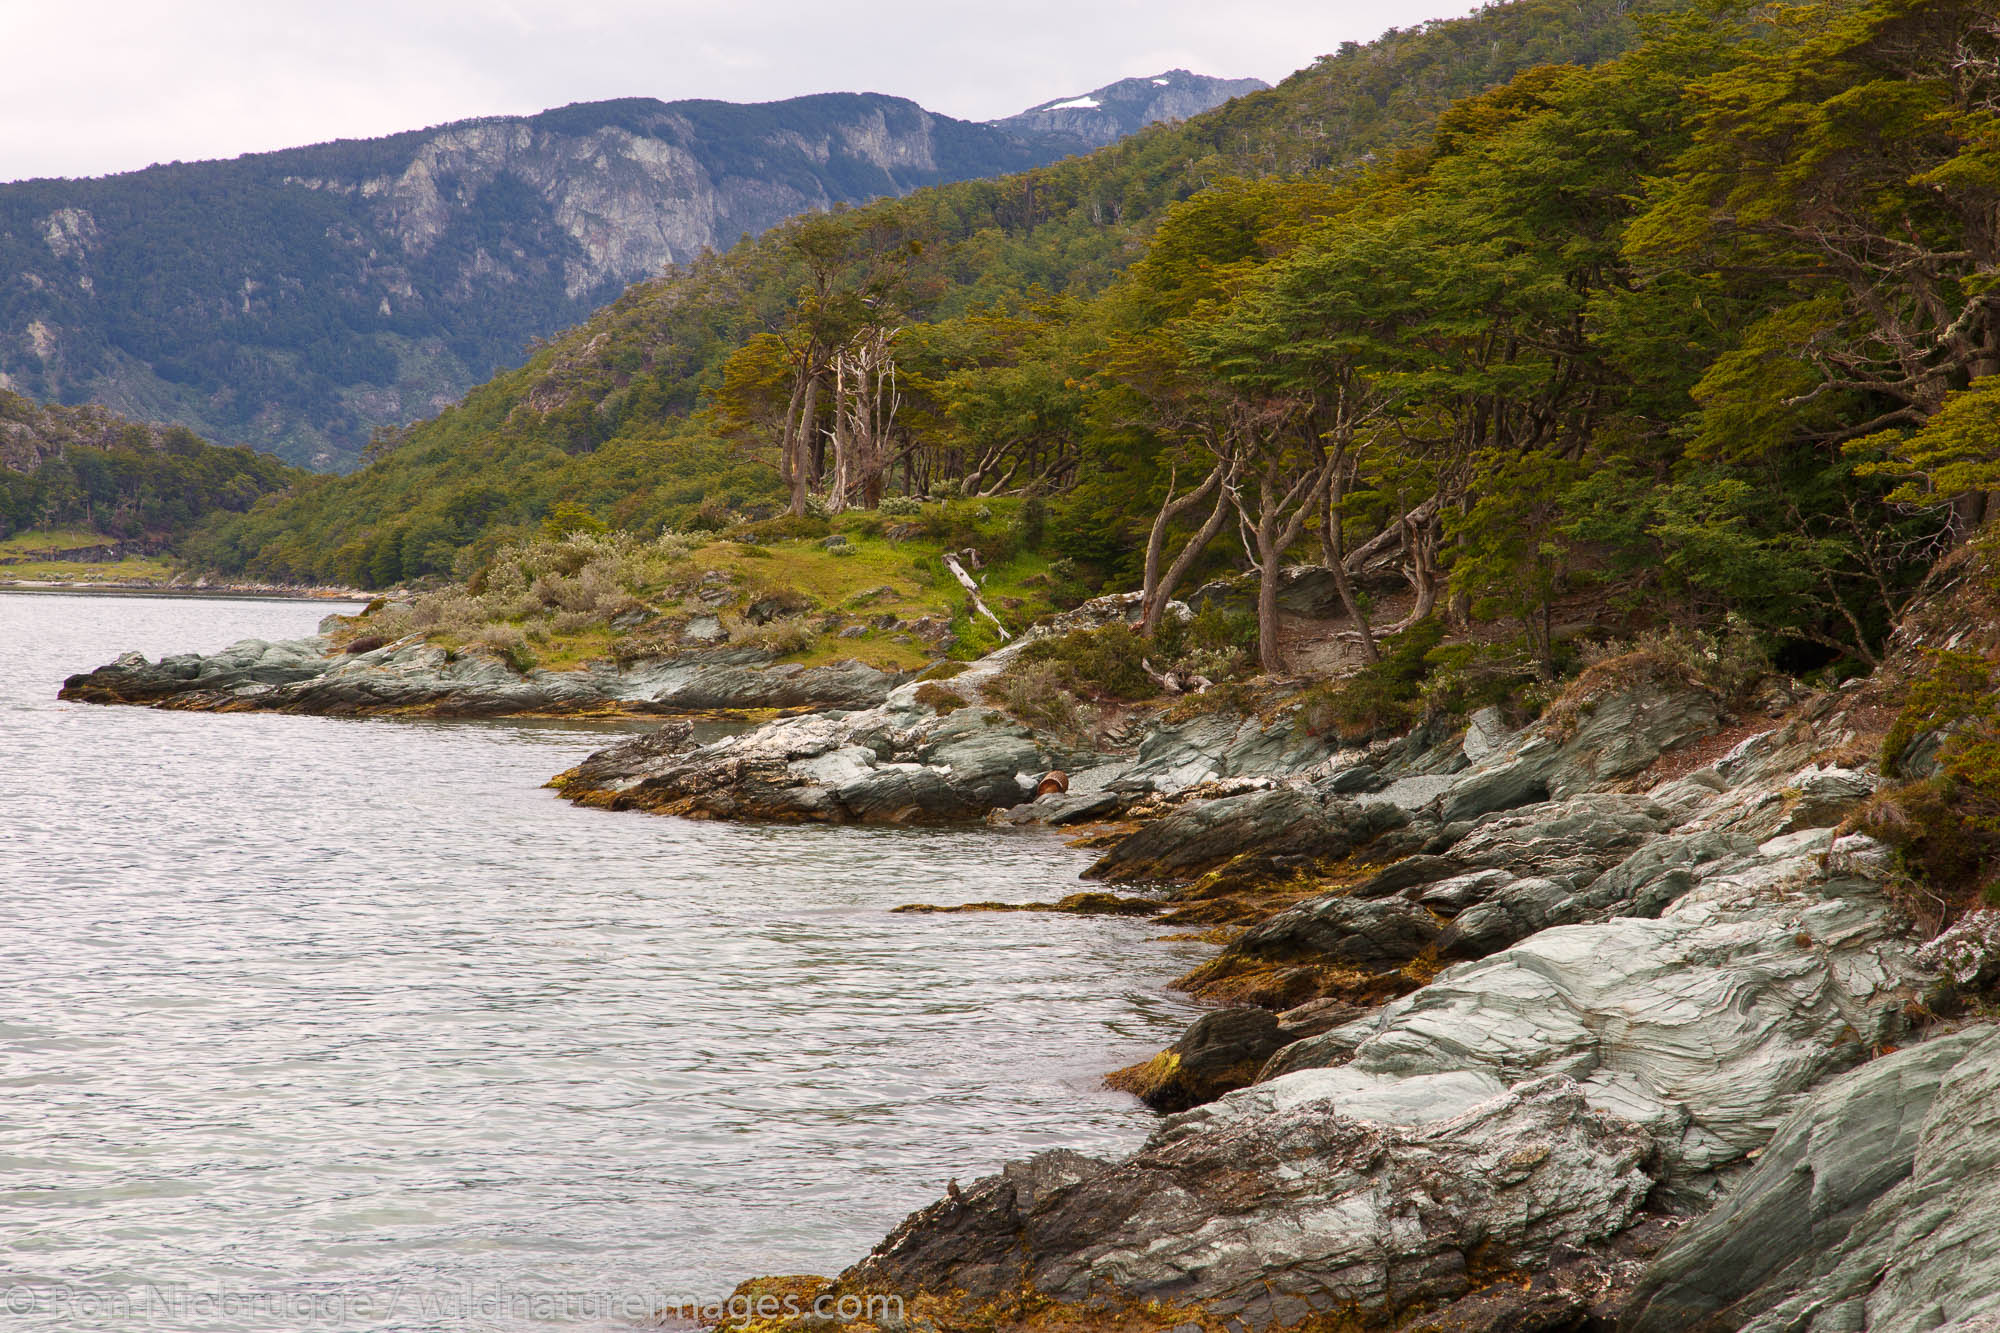 Coastal Trail, Tierra del Fuego National Park, Ushuaia, Argentina.